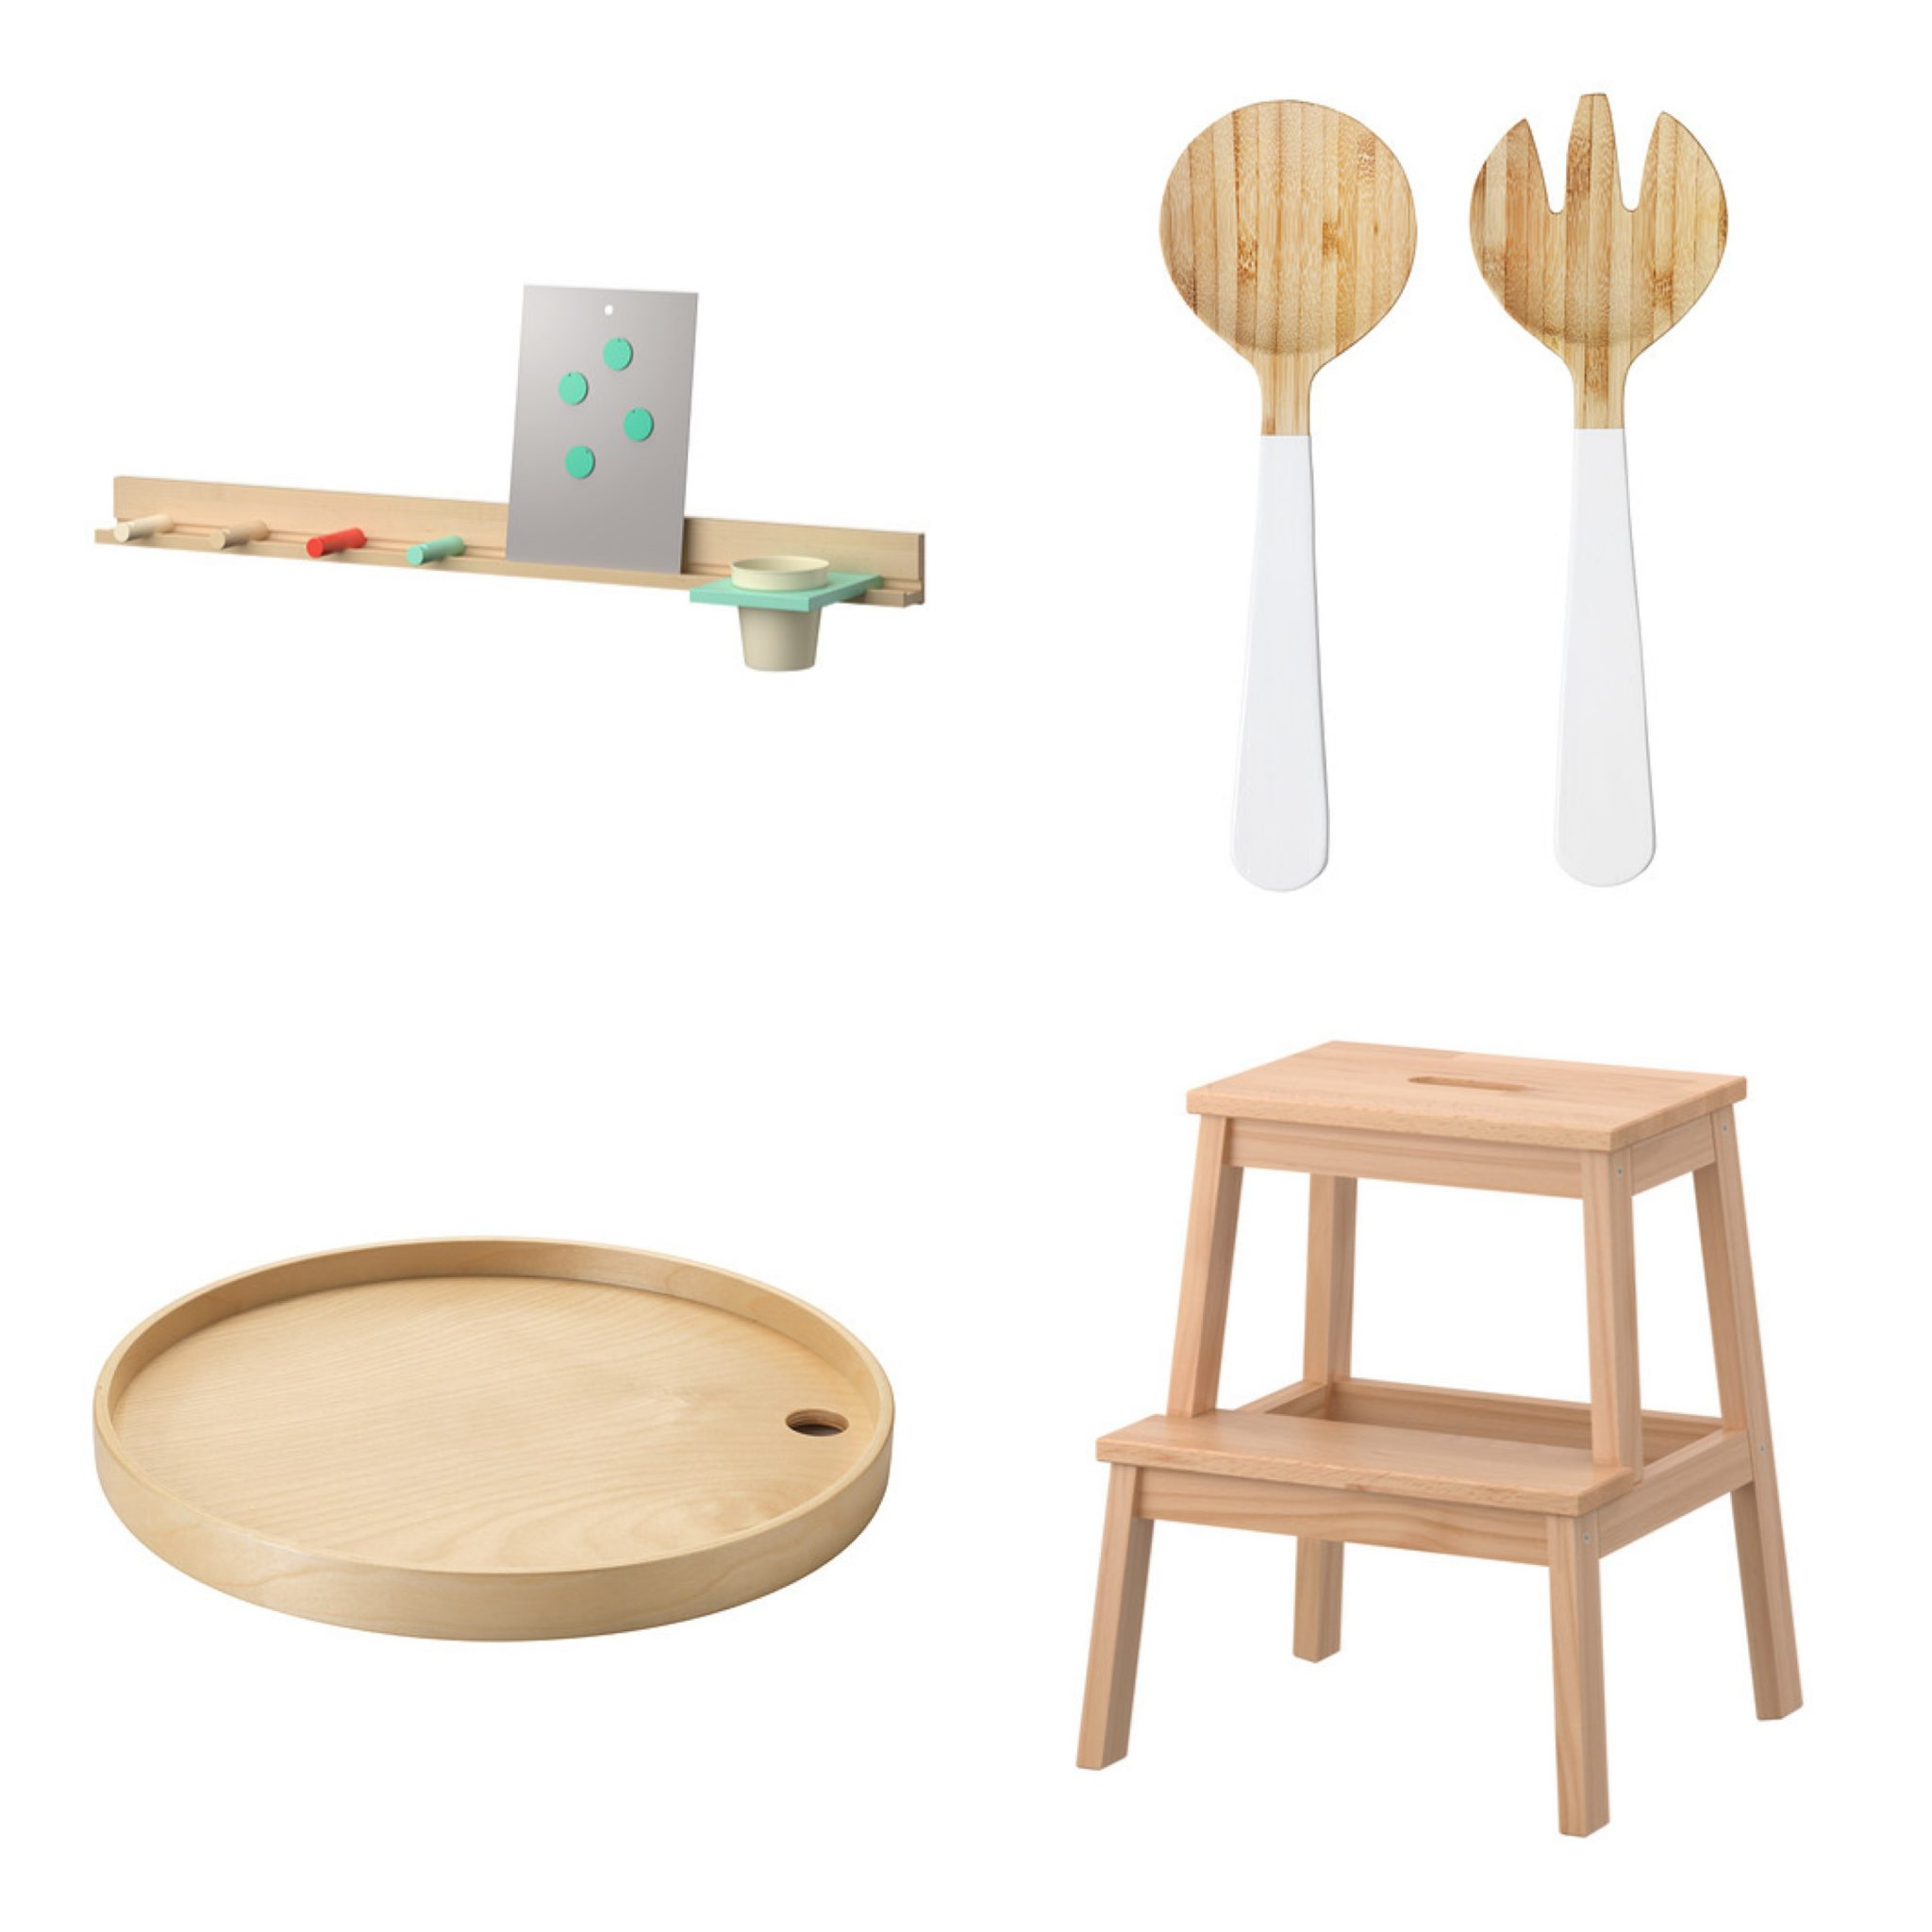 Clockwise From Top Left: IKEA PS 2014 Wall Rail ($44.99), GRIPANDE 2 Piece  Salad Servers Set ($6.99), BEKVÄM Step Stool ($14.99), IKEA PS 2014 Tray  ($15)